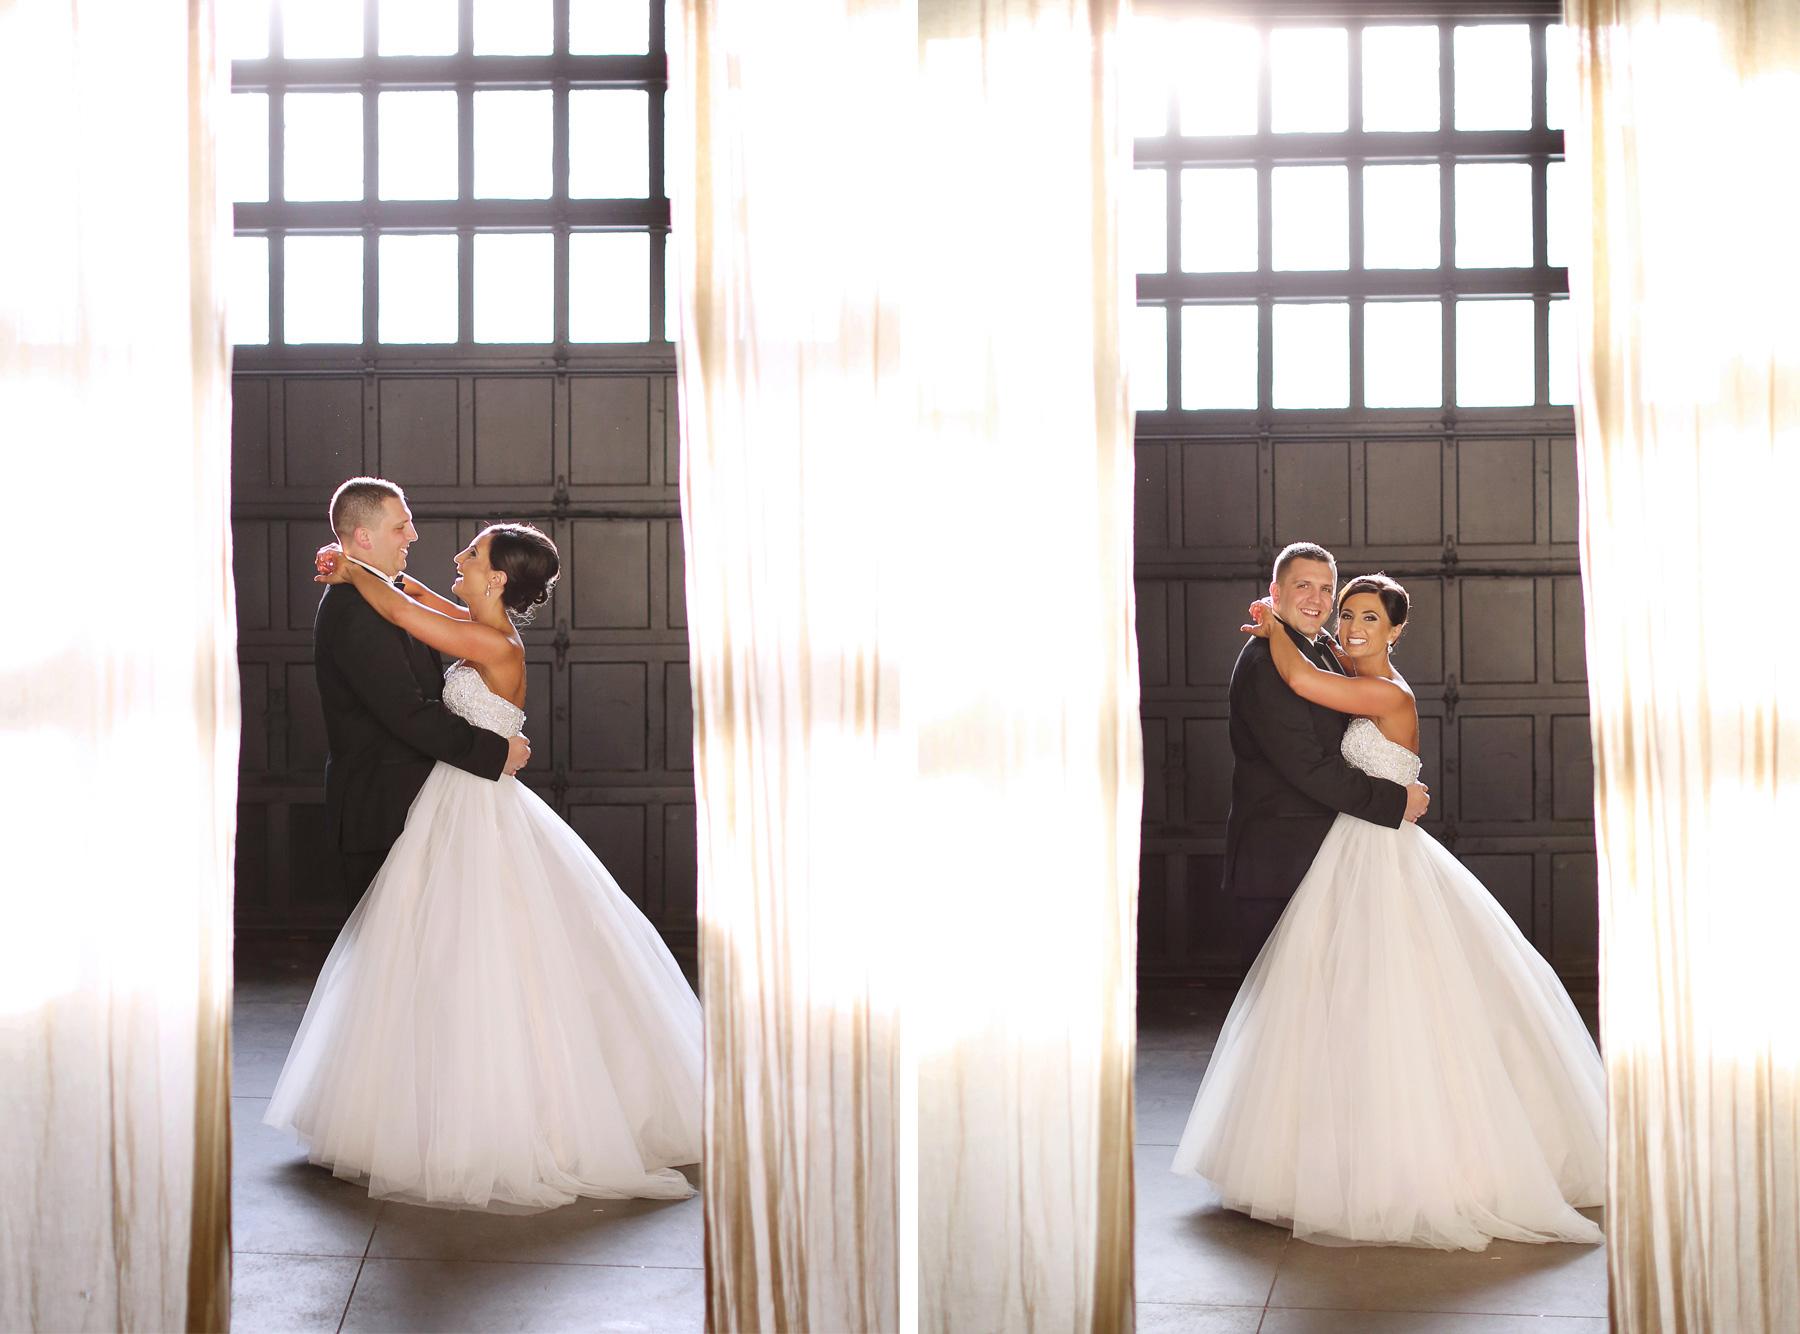 04-Minneapolis-Minnesota-Wedding-Photography-Aria-Downtown-Industrial-Warehouse-Melanie-and-Andrew.jpg